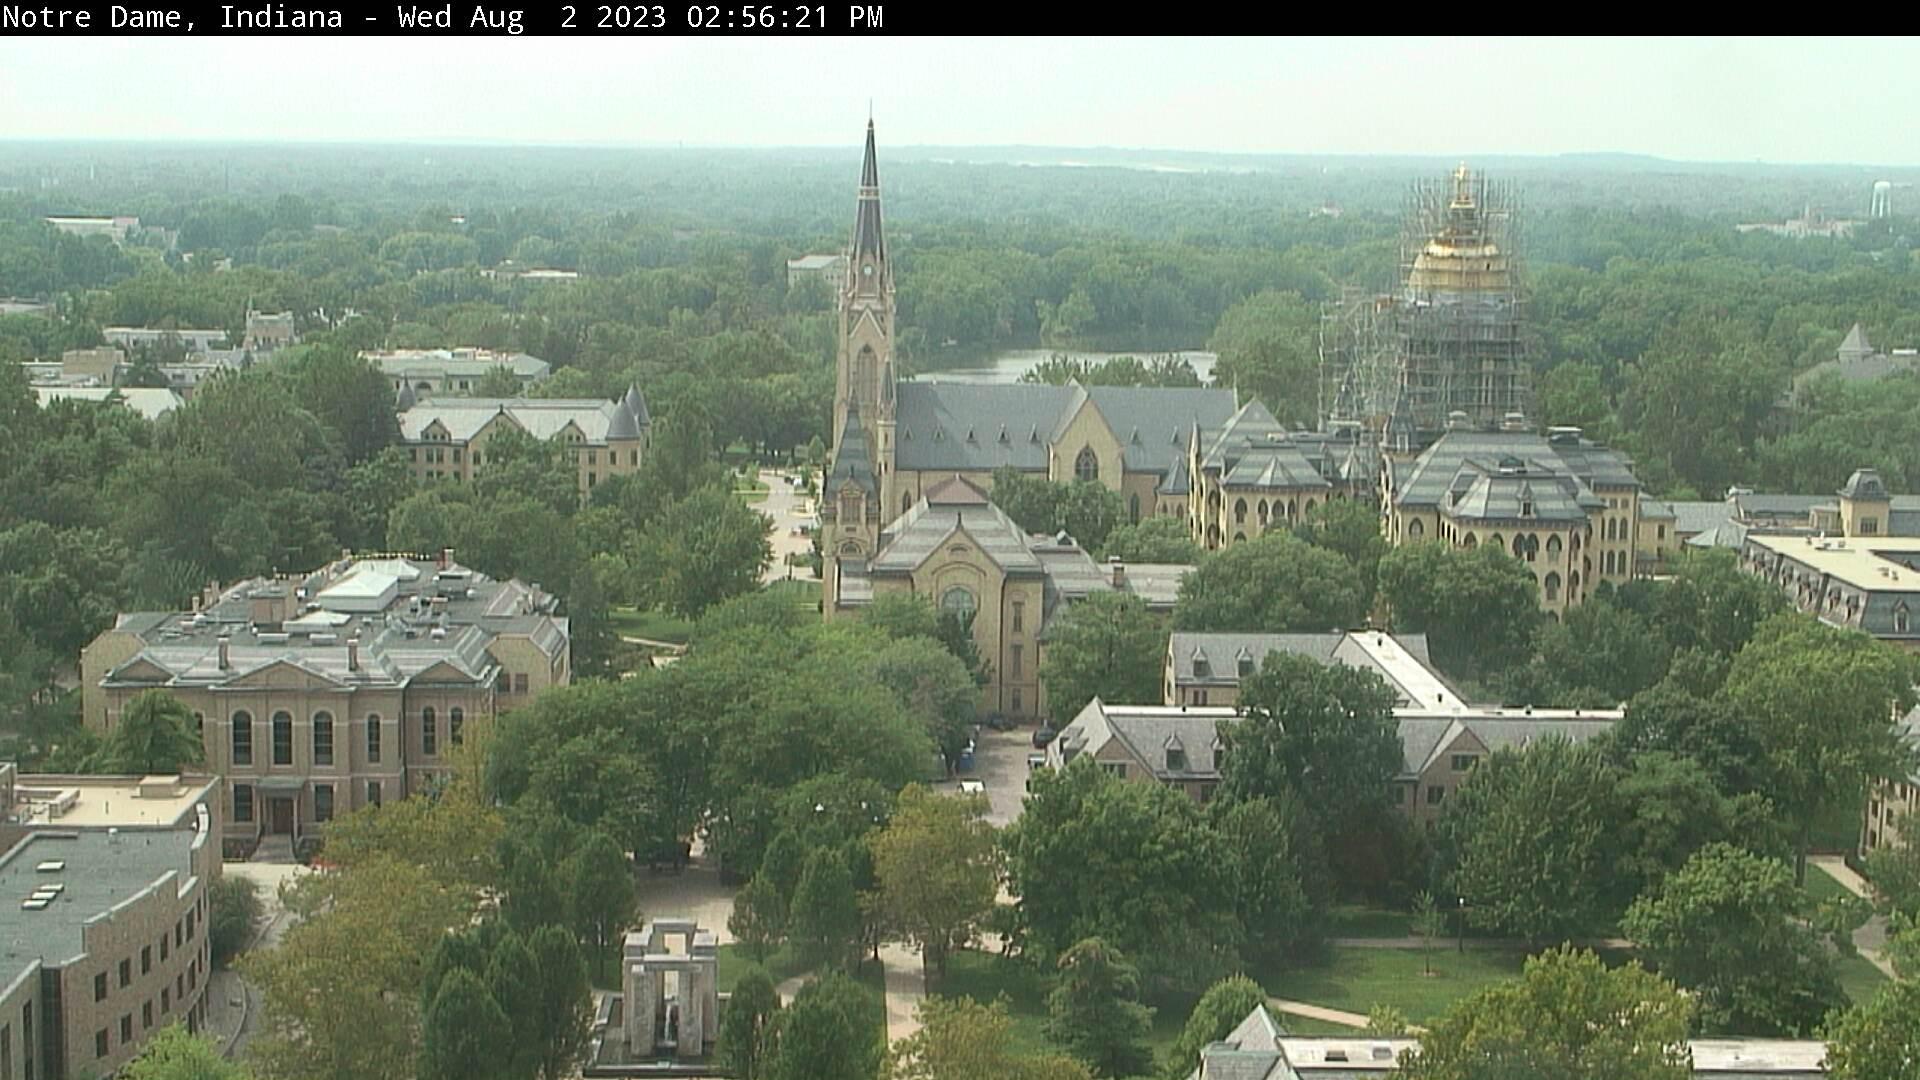 Notre Dame, Indiana Sat. 14:56